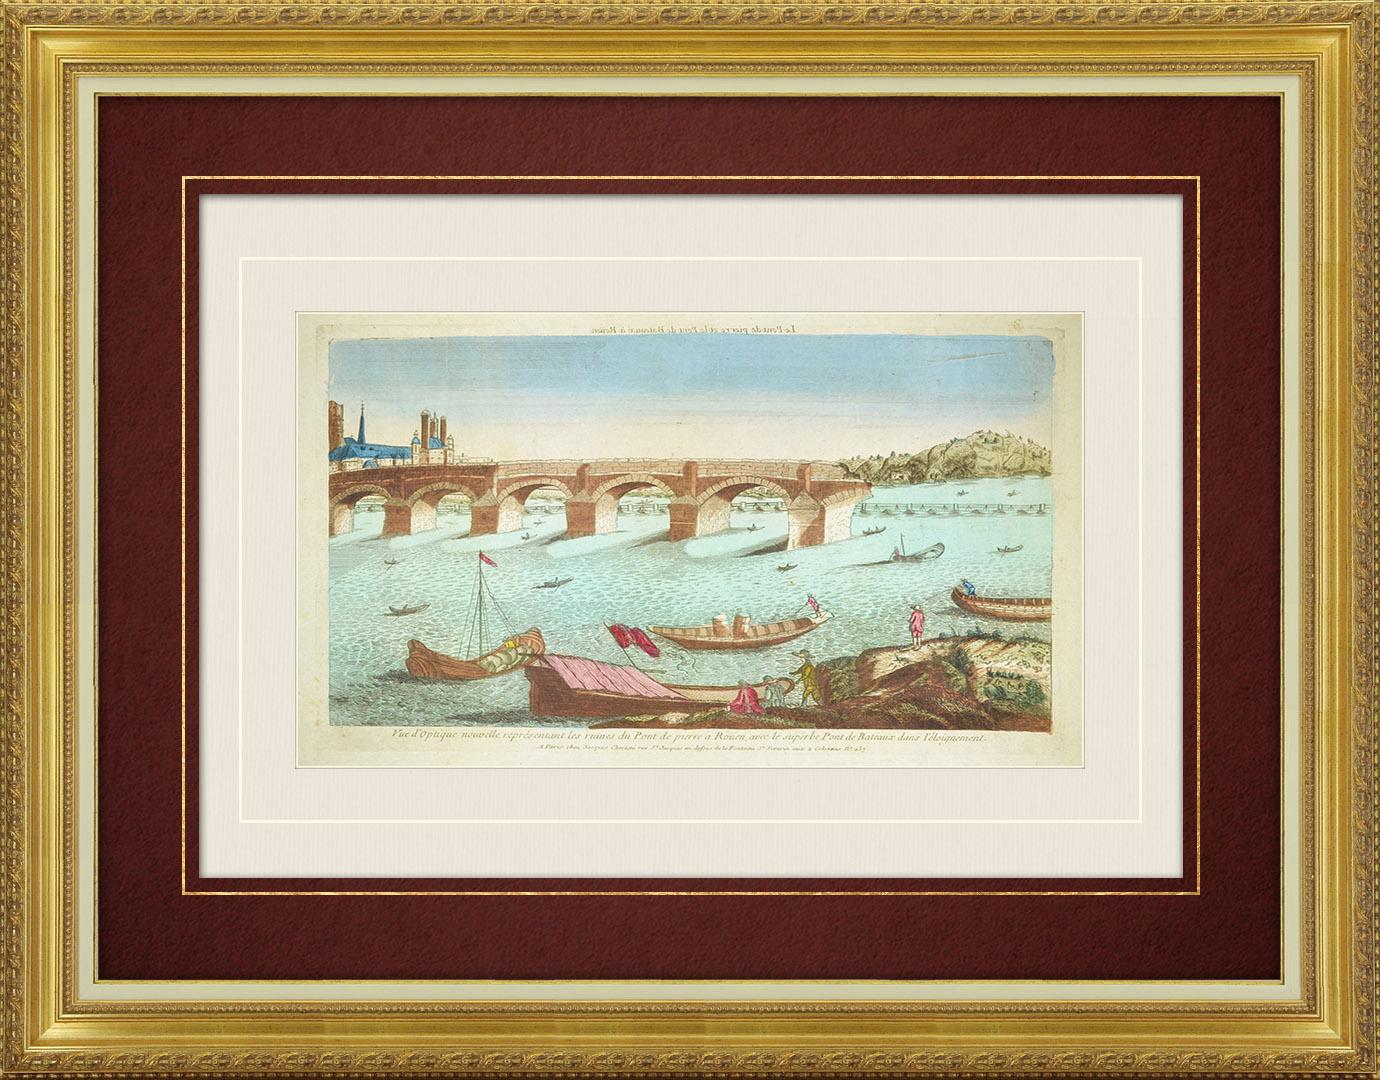 18th Century optical view in original watercolors of the Stone Bridge in Rouen (France)